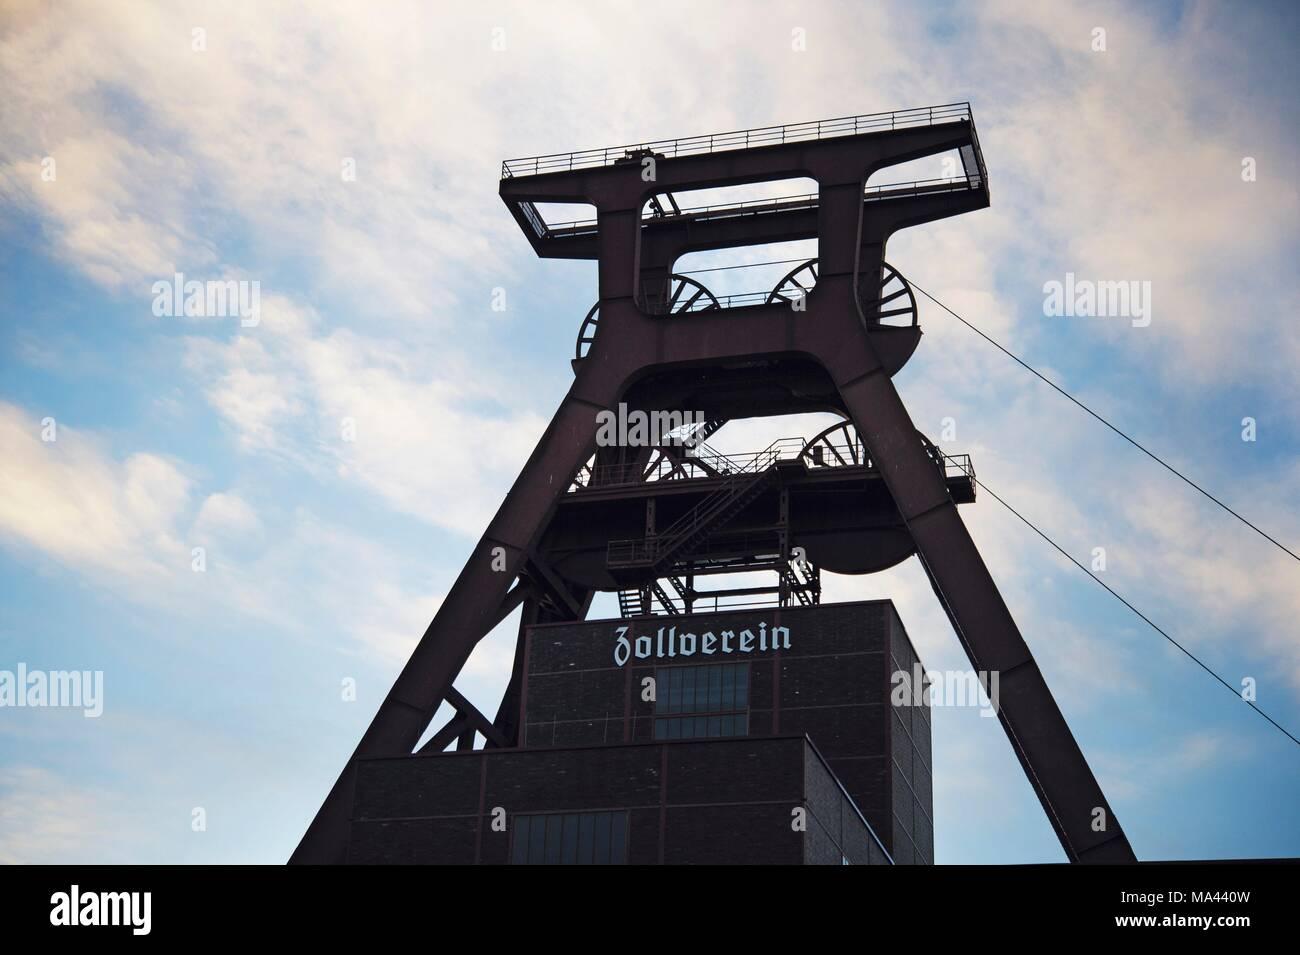 The Zollverein Coal Mine Industrial Complex, a UNESCO World Heritage Site, in Essen, North Rhine-Westphalia, Germany - Stock Image